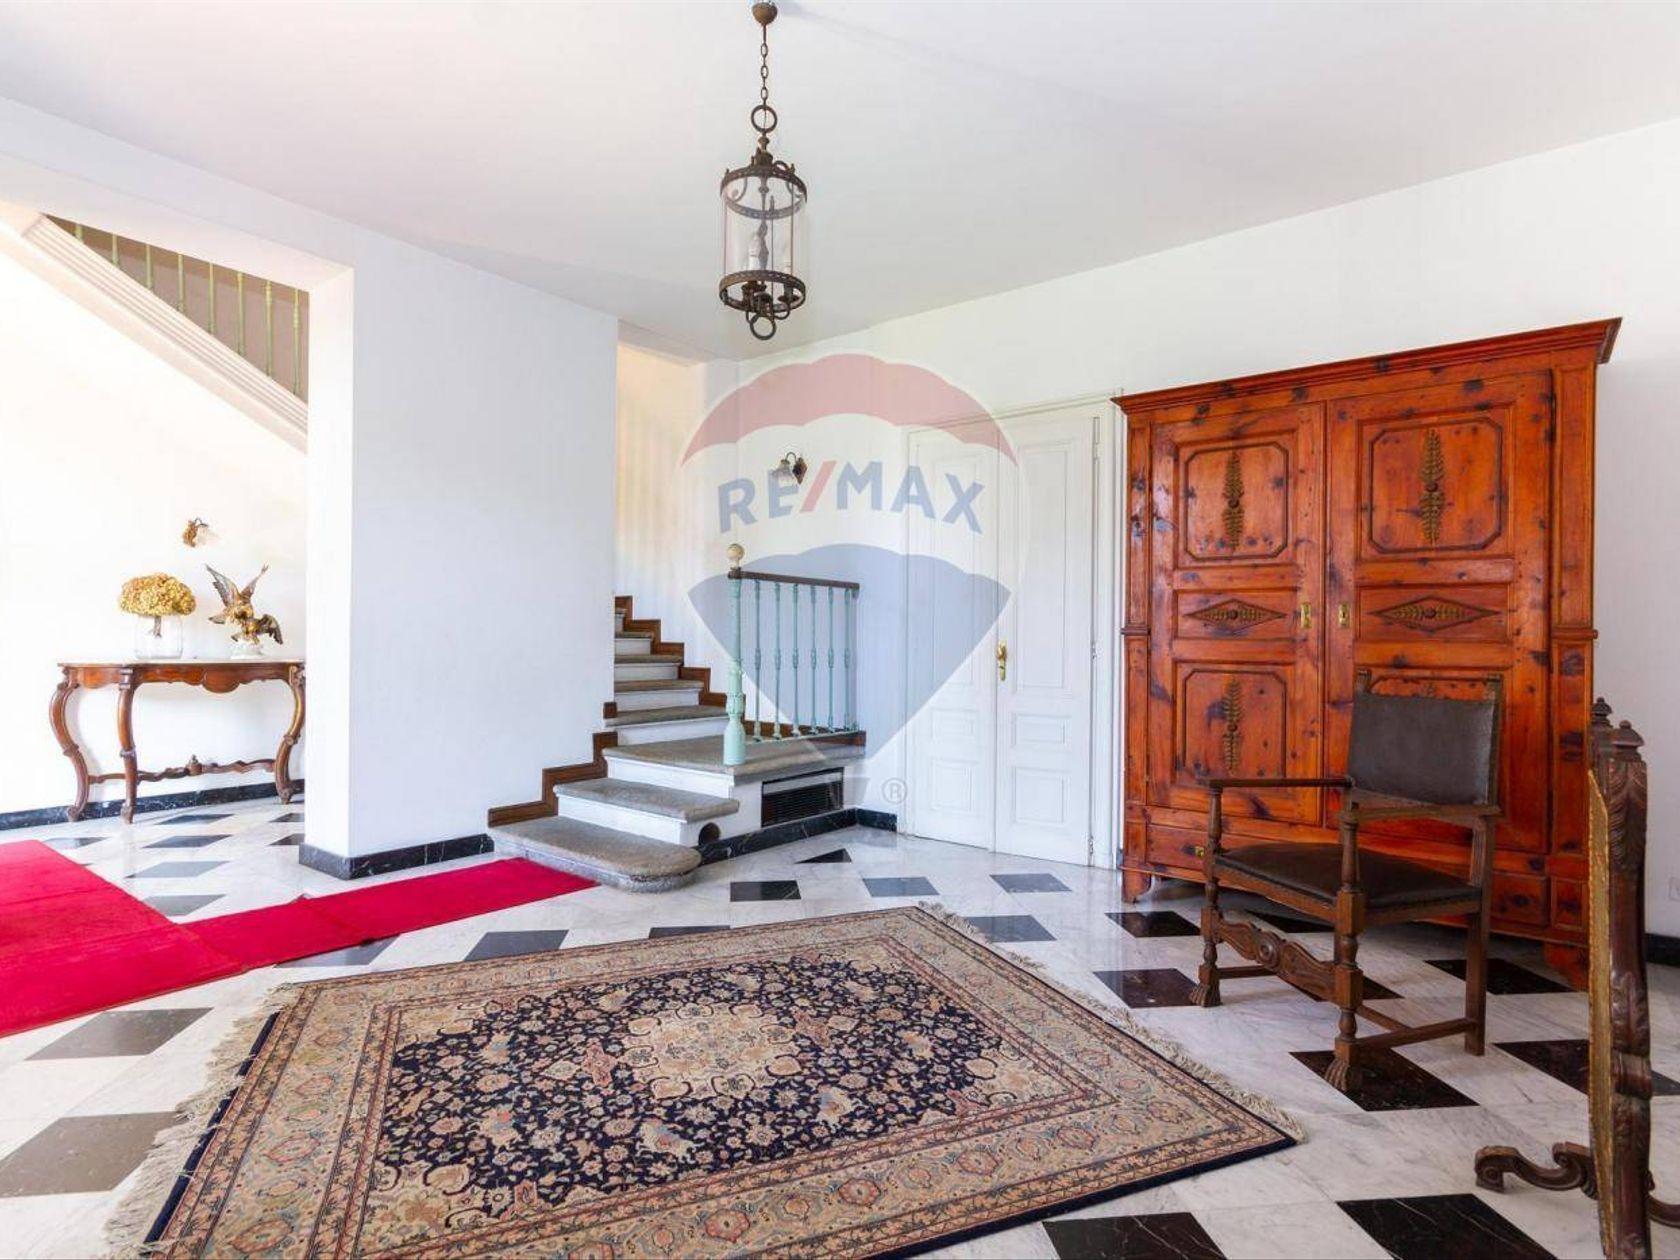 Casa Indipendente Torino-precollina Collina, Torino, TO Vendita - Foto 30